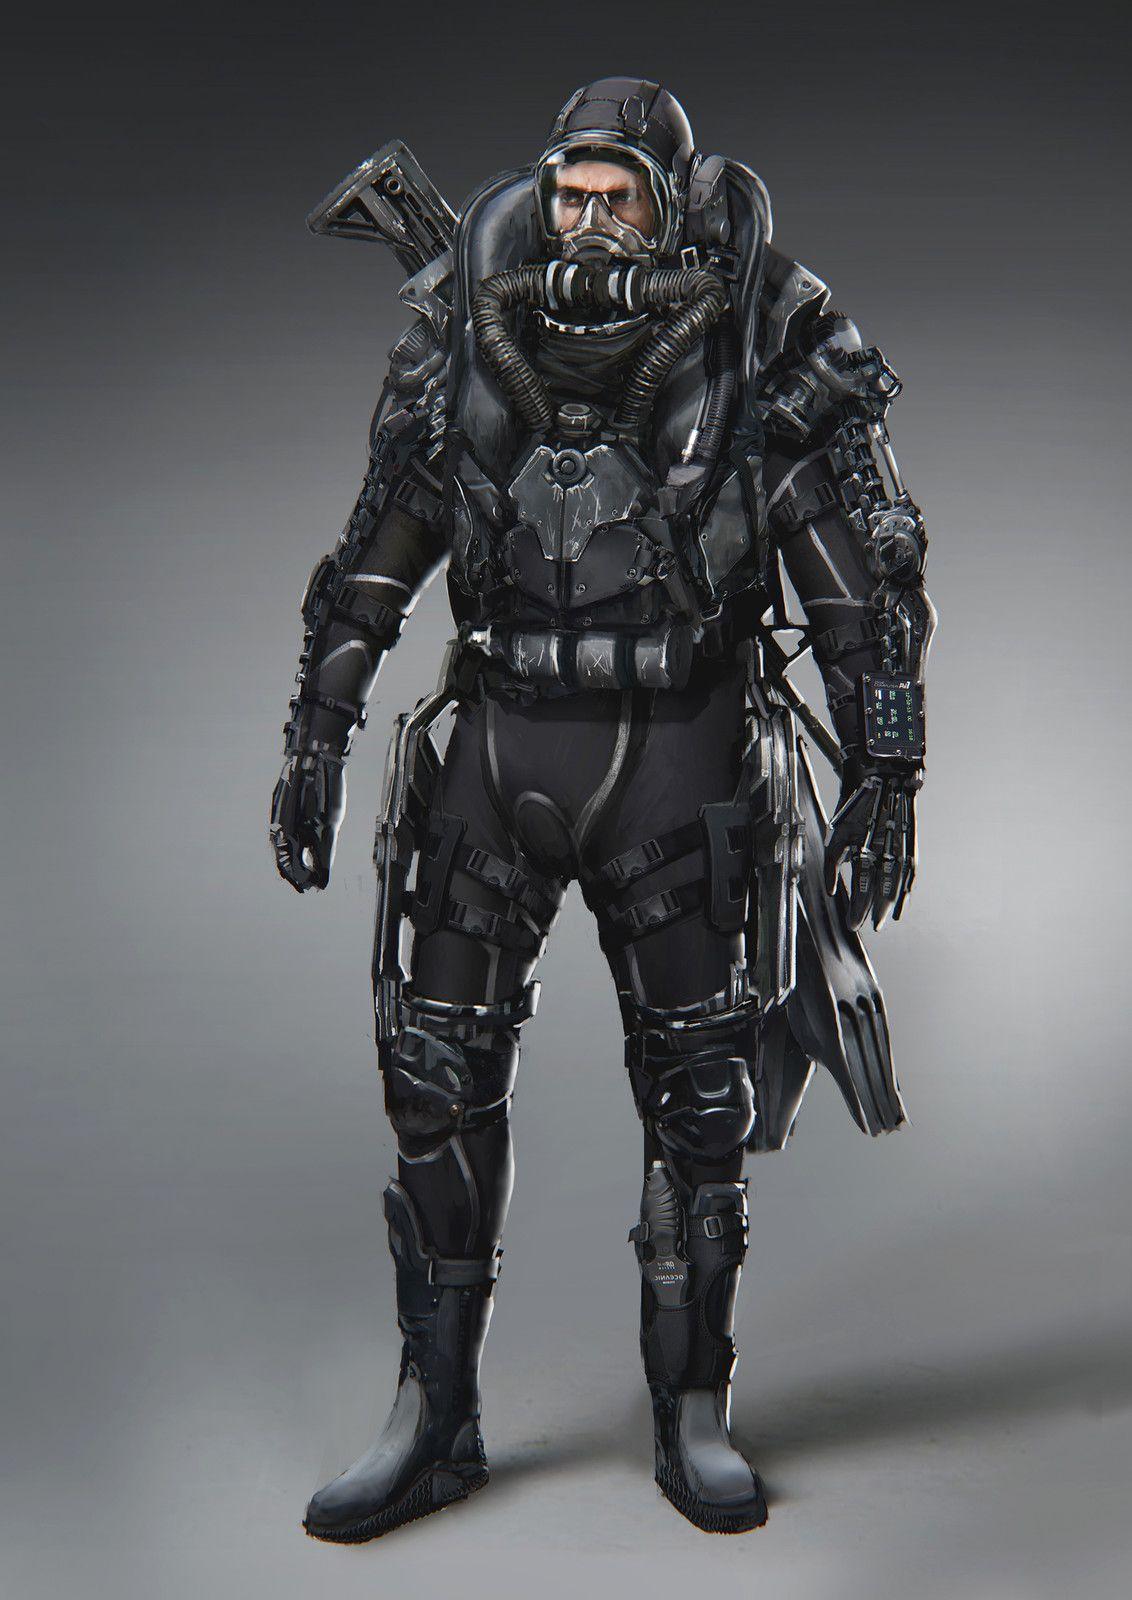 Pin by donald mckelvy on cyberpunk pinterest diving deep sea diver and scuba diving - Navy seal dive gear ...